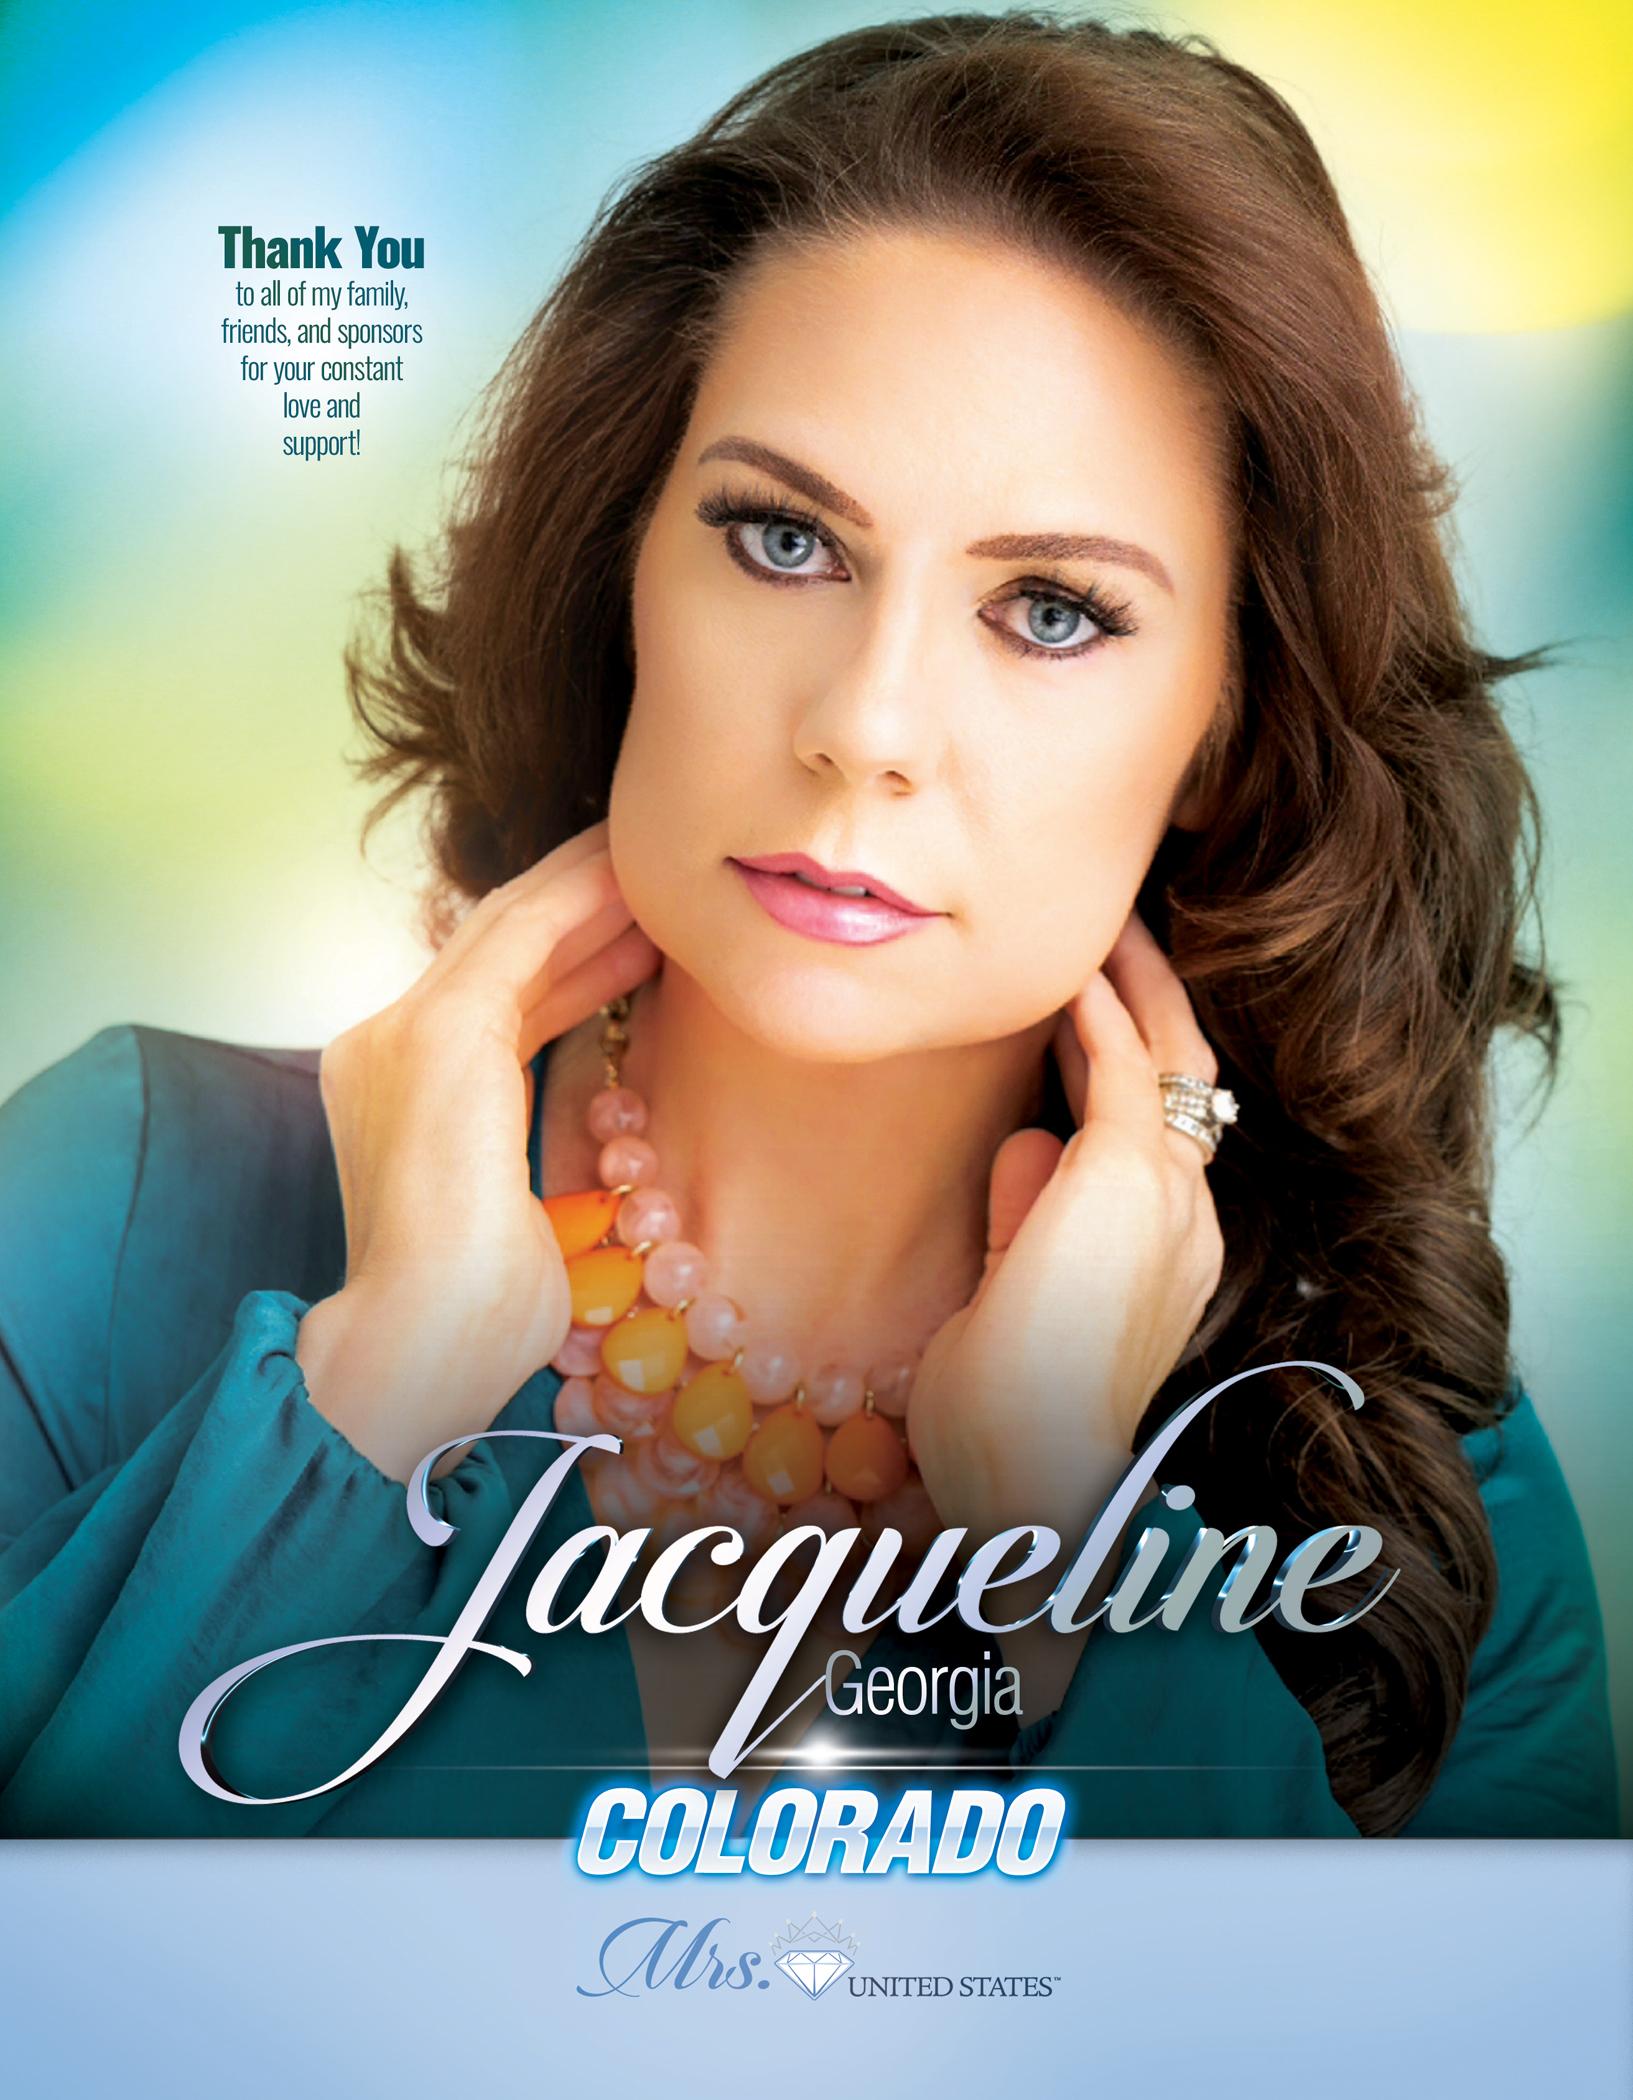 Jacqueline Georgia Mrs. Colorado United States - 2019